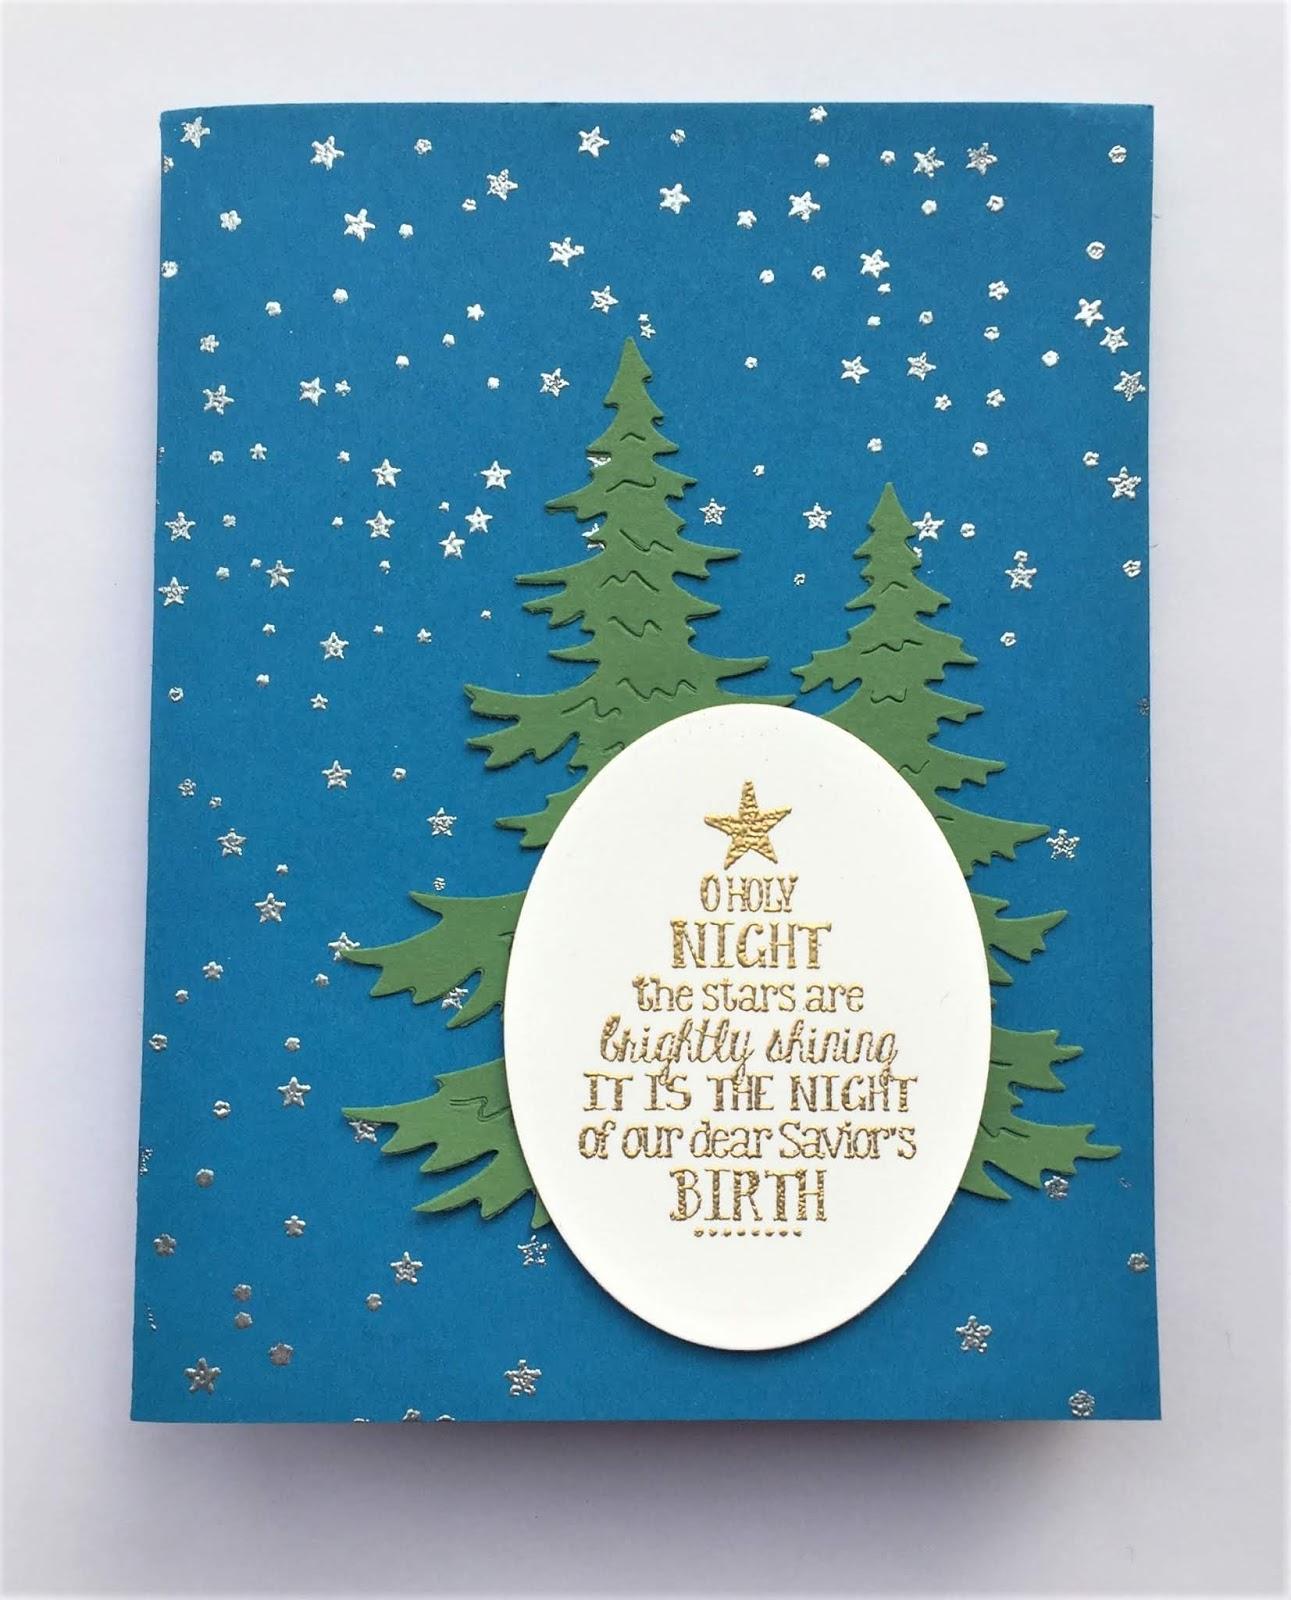 Paper Vernissage Jingle Belles Hark The Herald Angels Sing